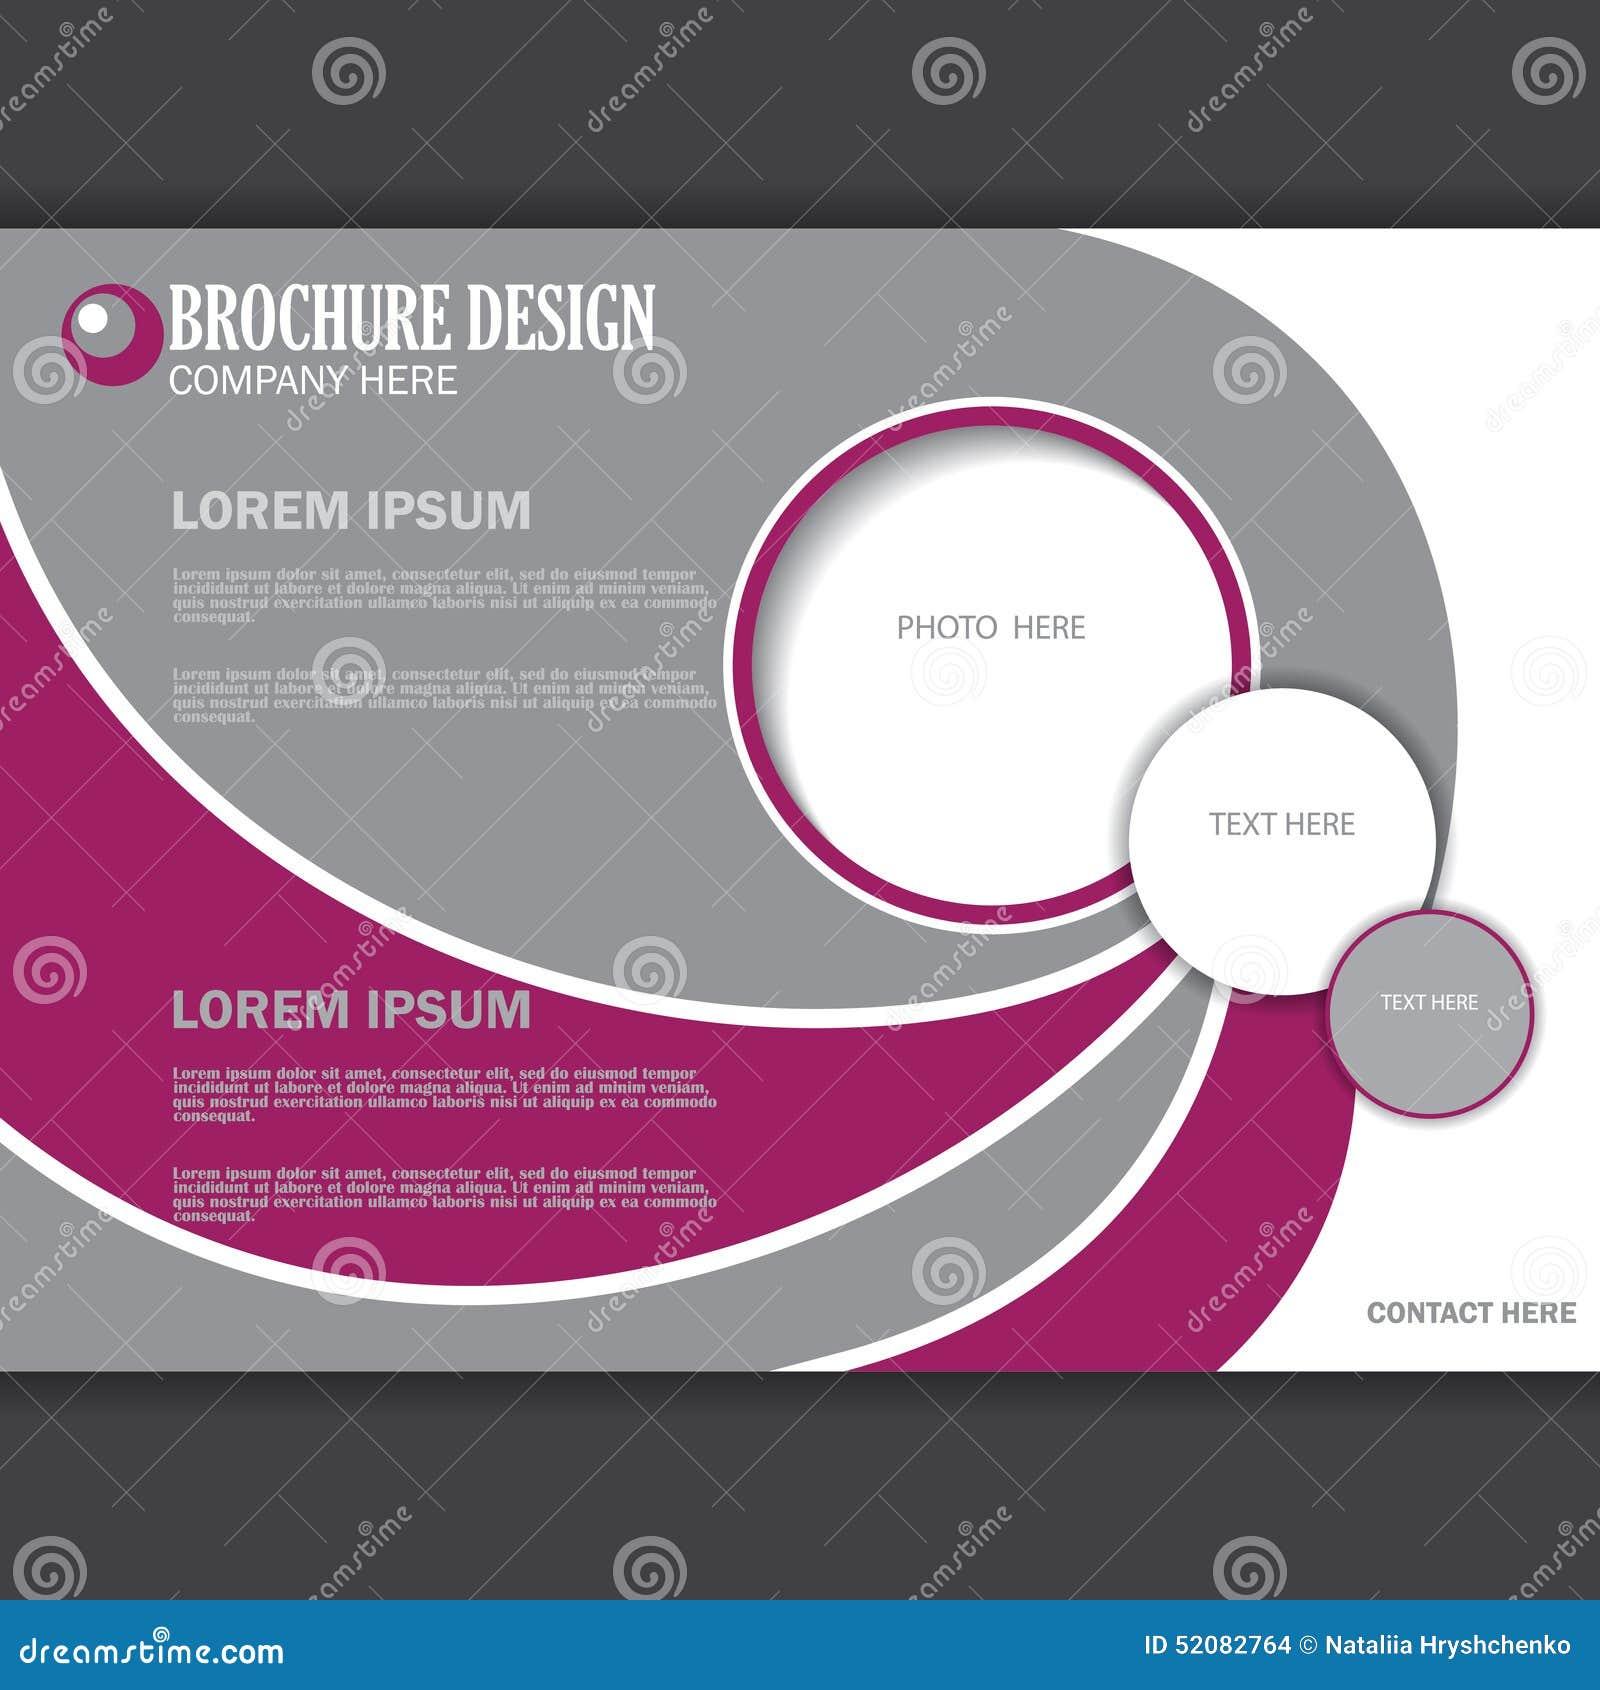 vector horizontal presentation of business poster stock